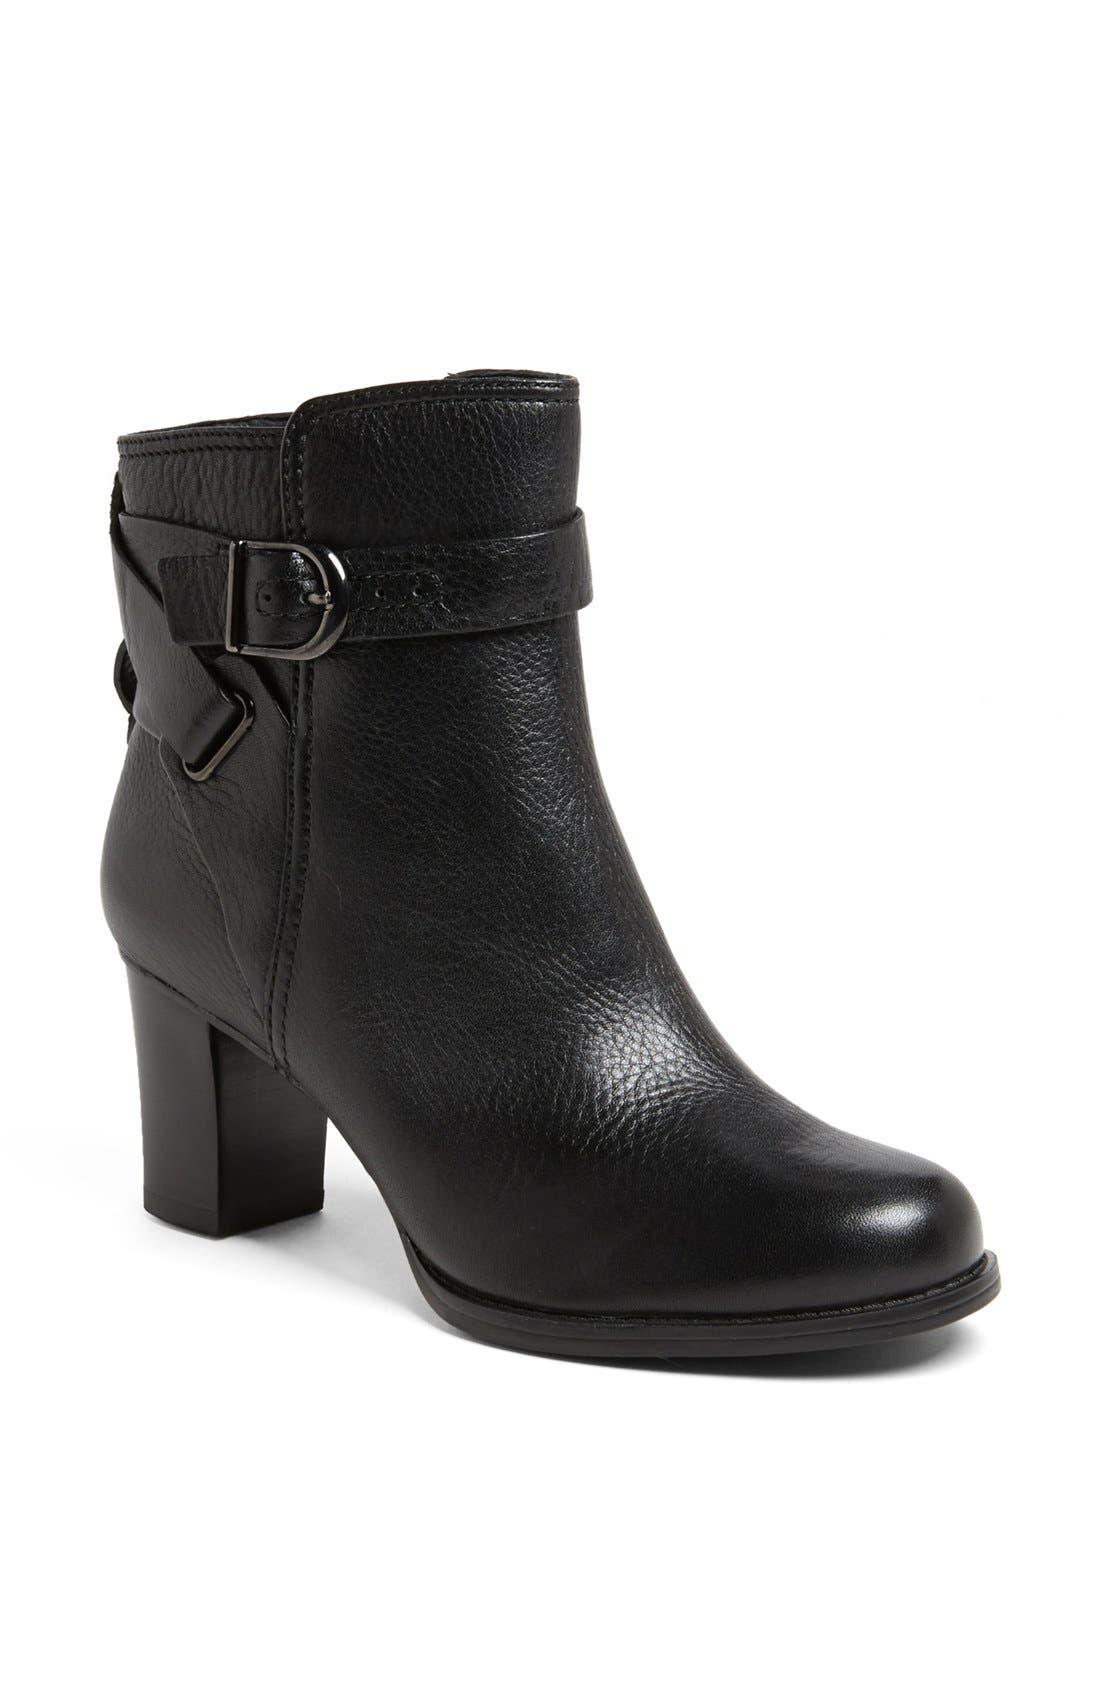 Main Image - Clarks 'Jolissa Topaz' Boot